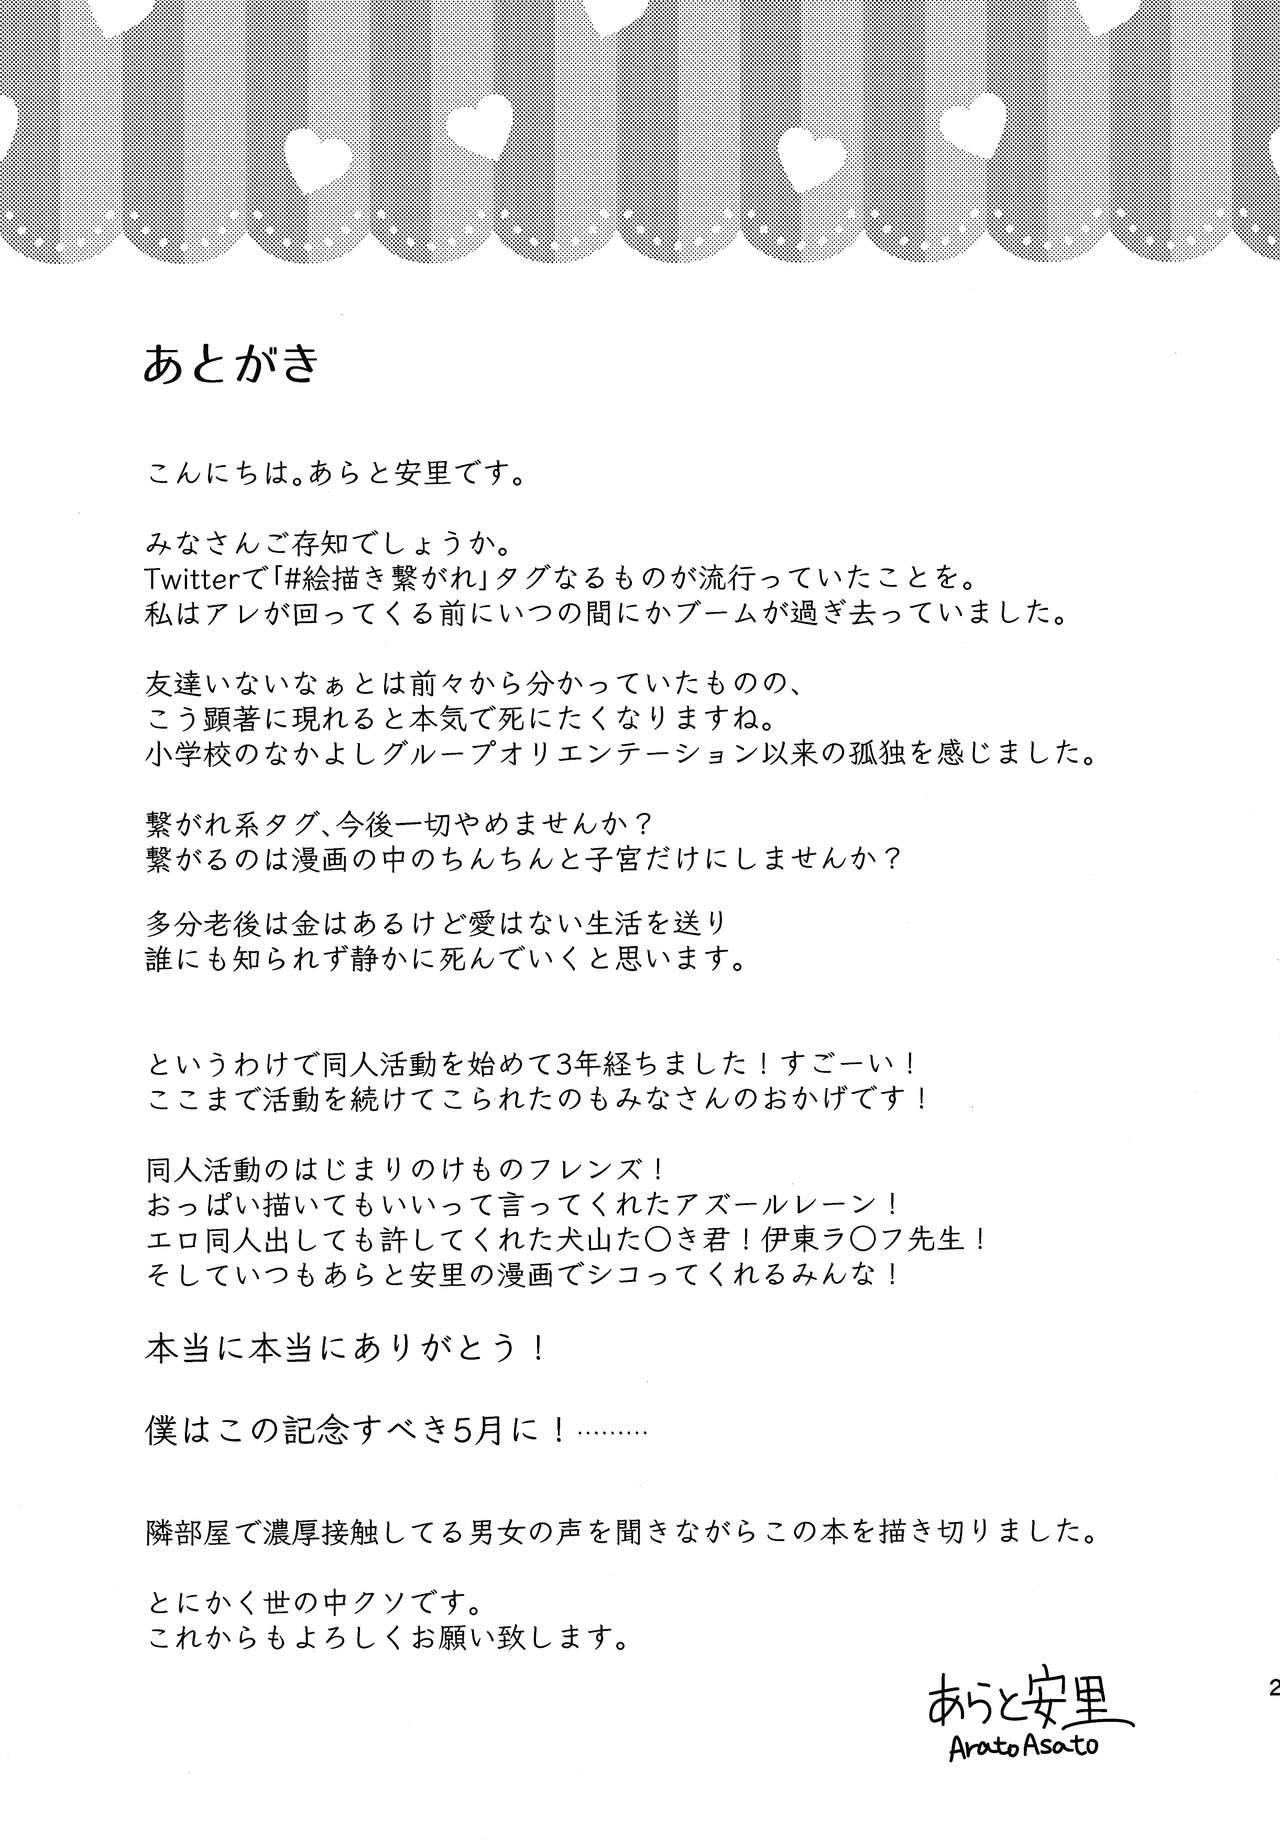 Formidable wa Shikikan de Asobitai - Formidable wants to play a commander 19